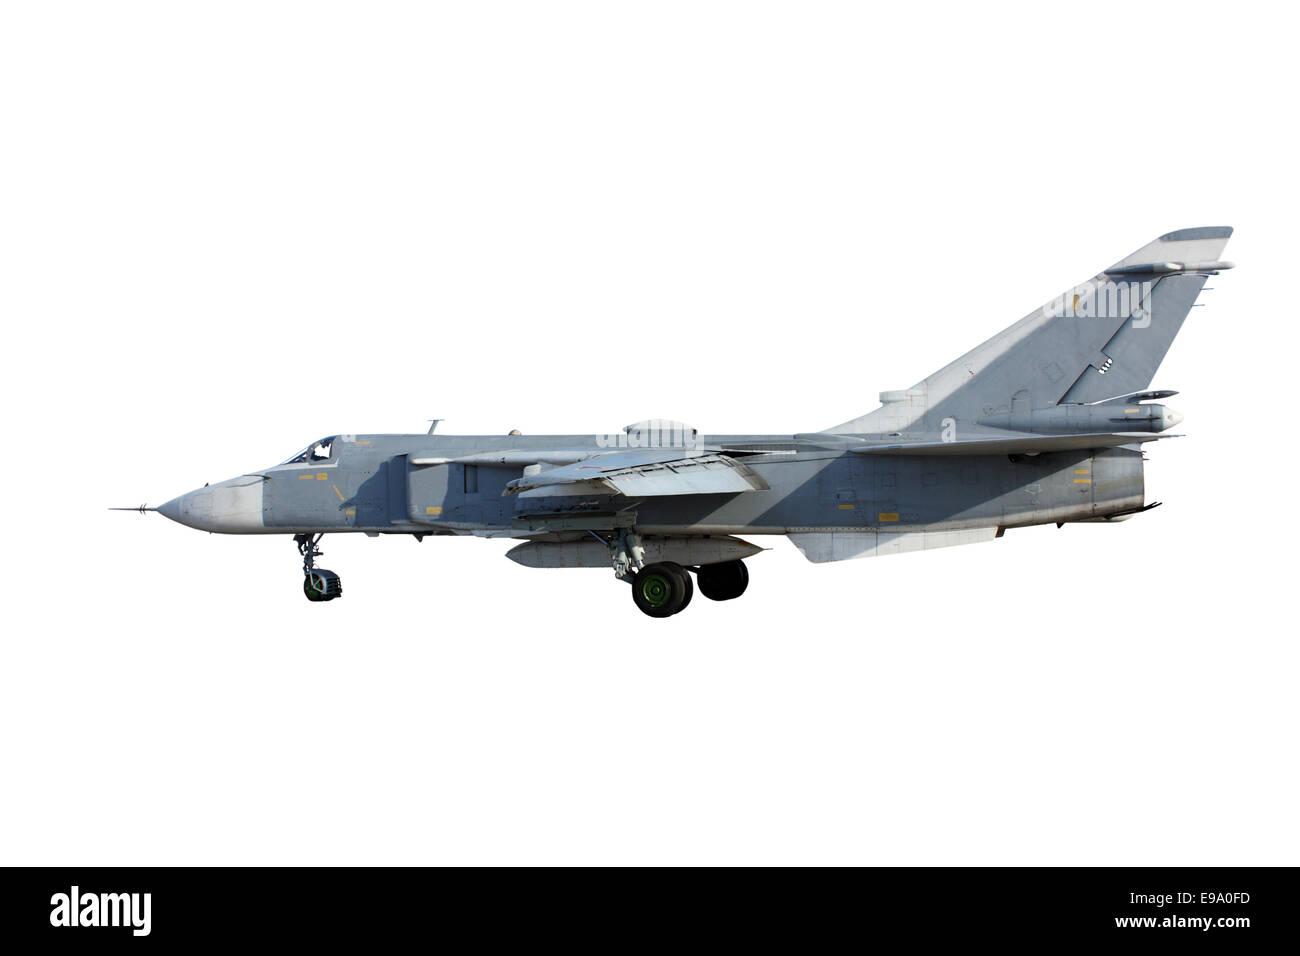 Su-24 Fencer on take off - Stock Image